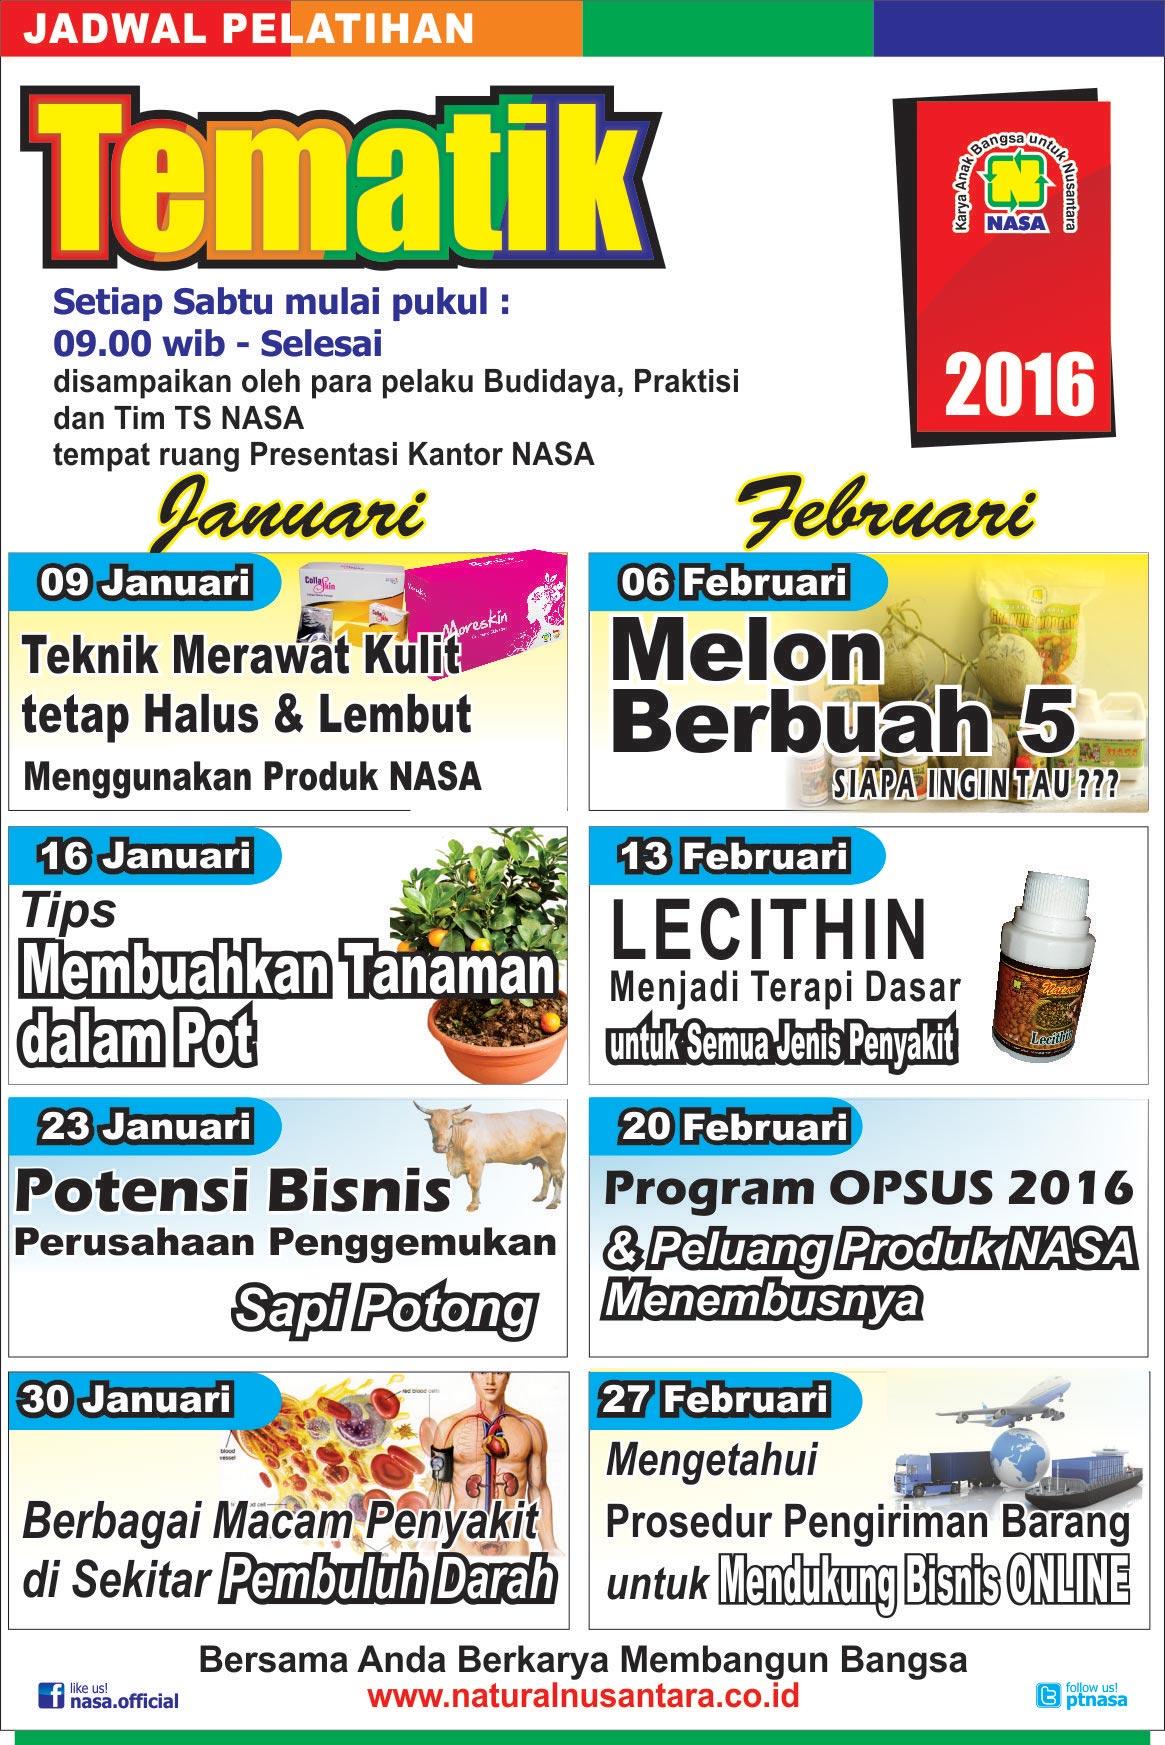 Jadwal Training Tematik 2016